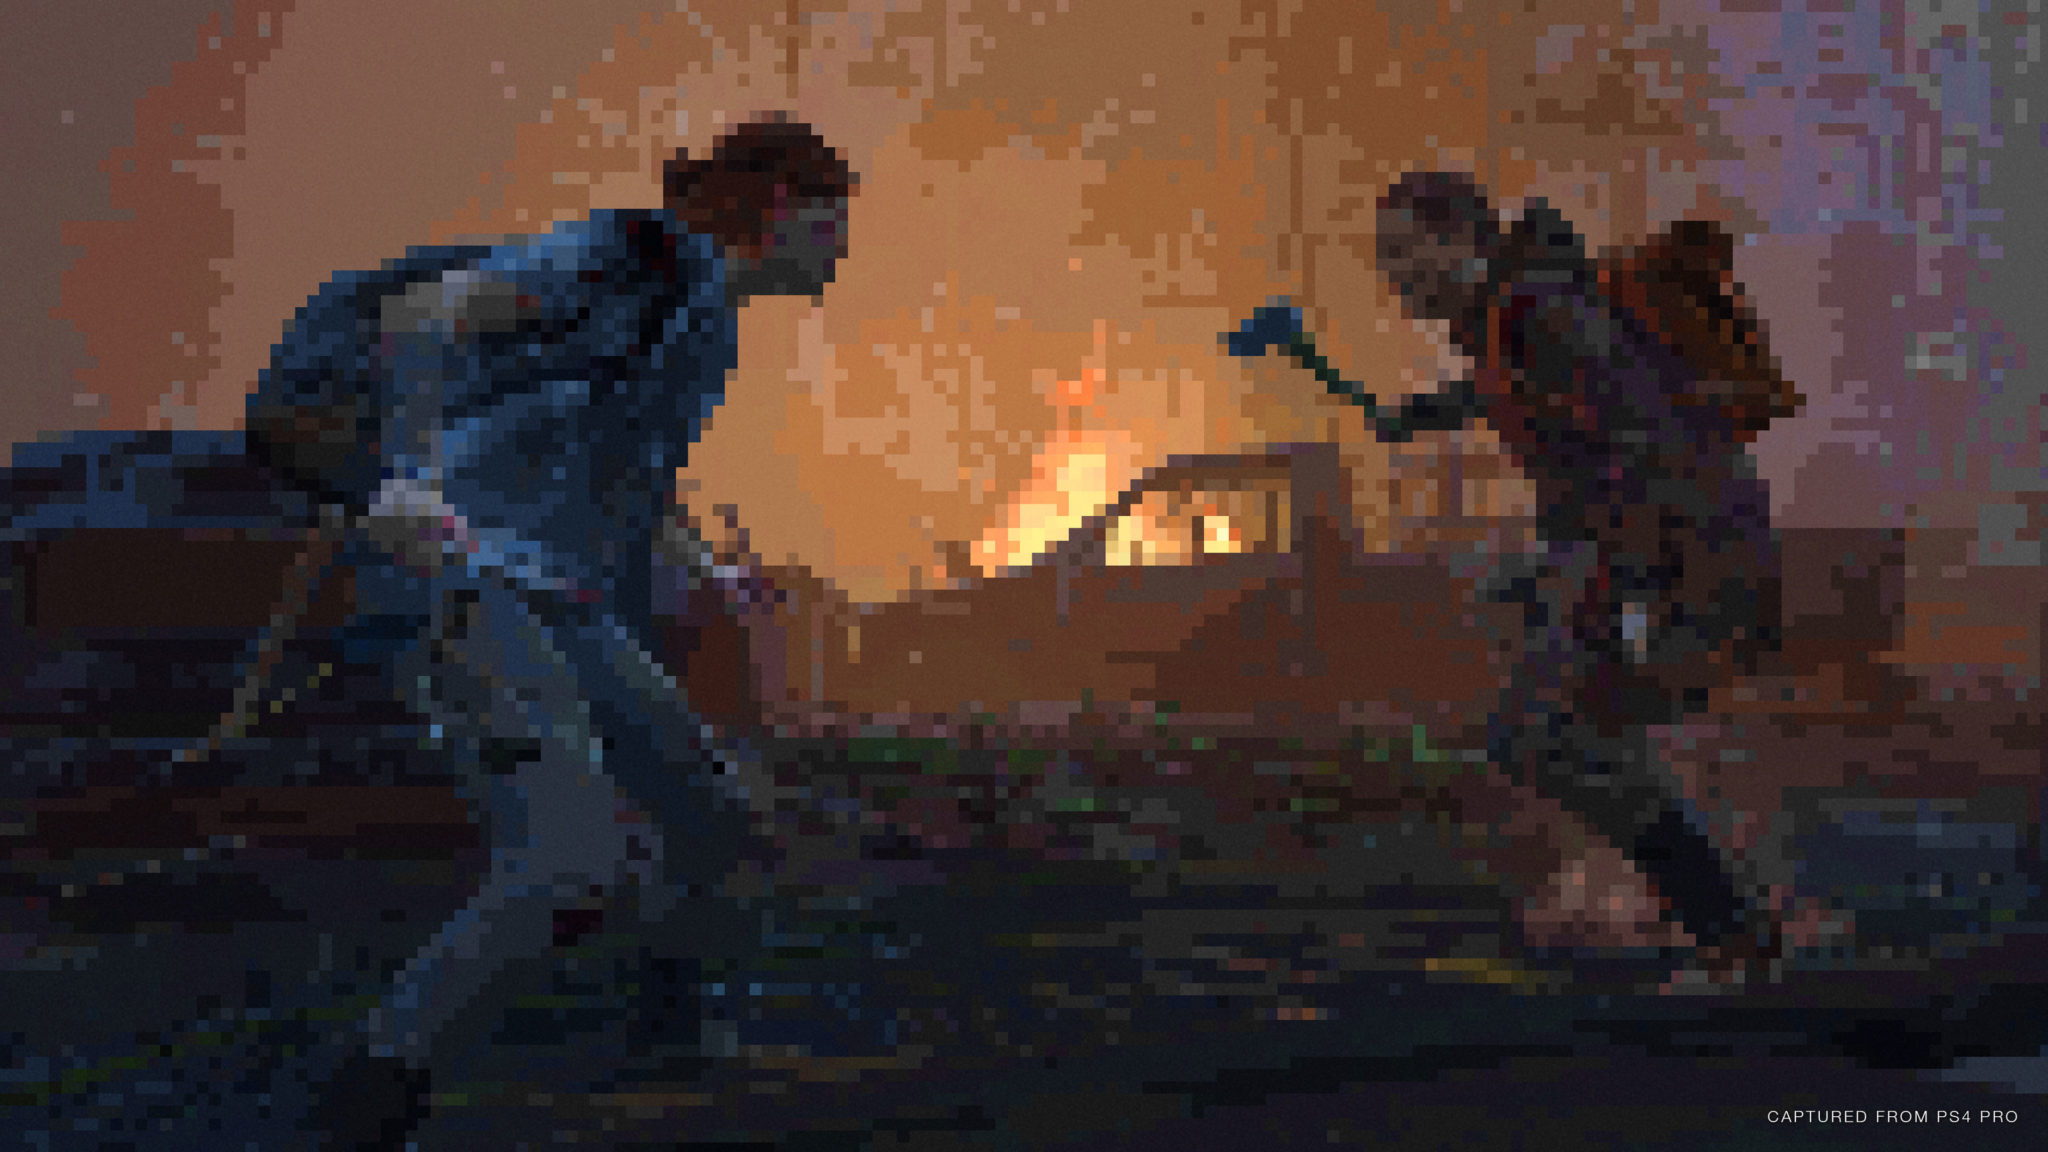 The Last of Us Part II Pixelated